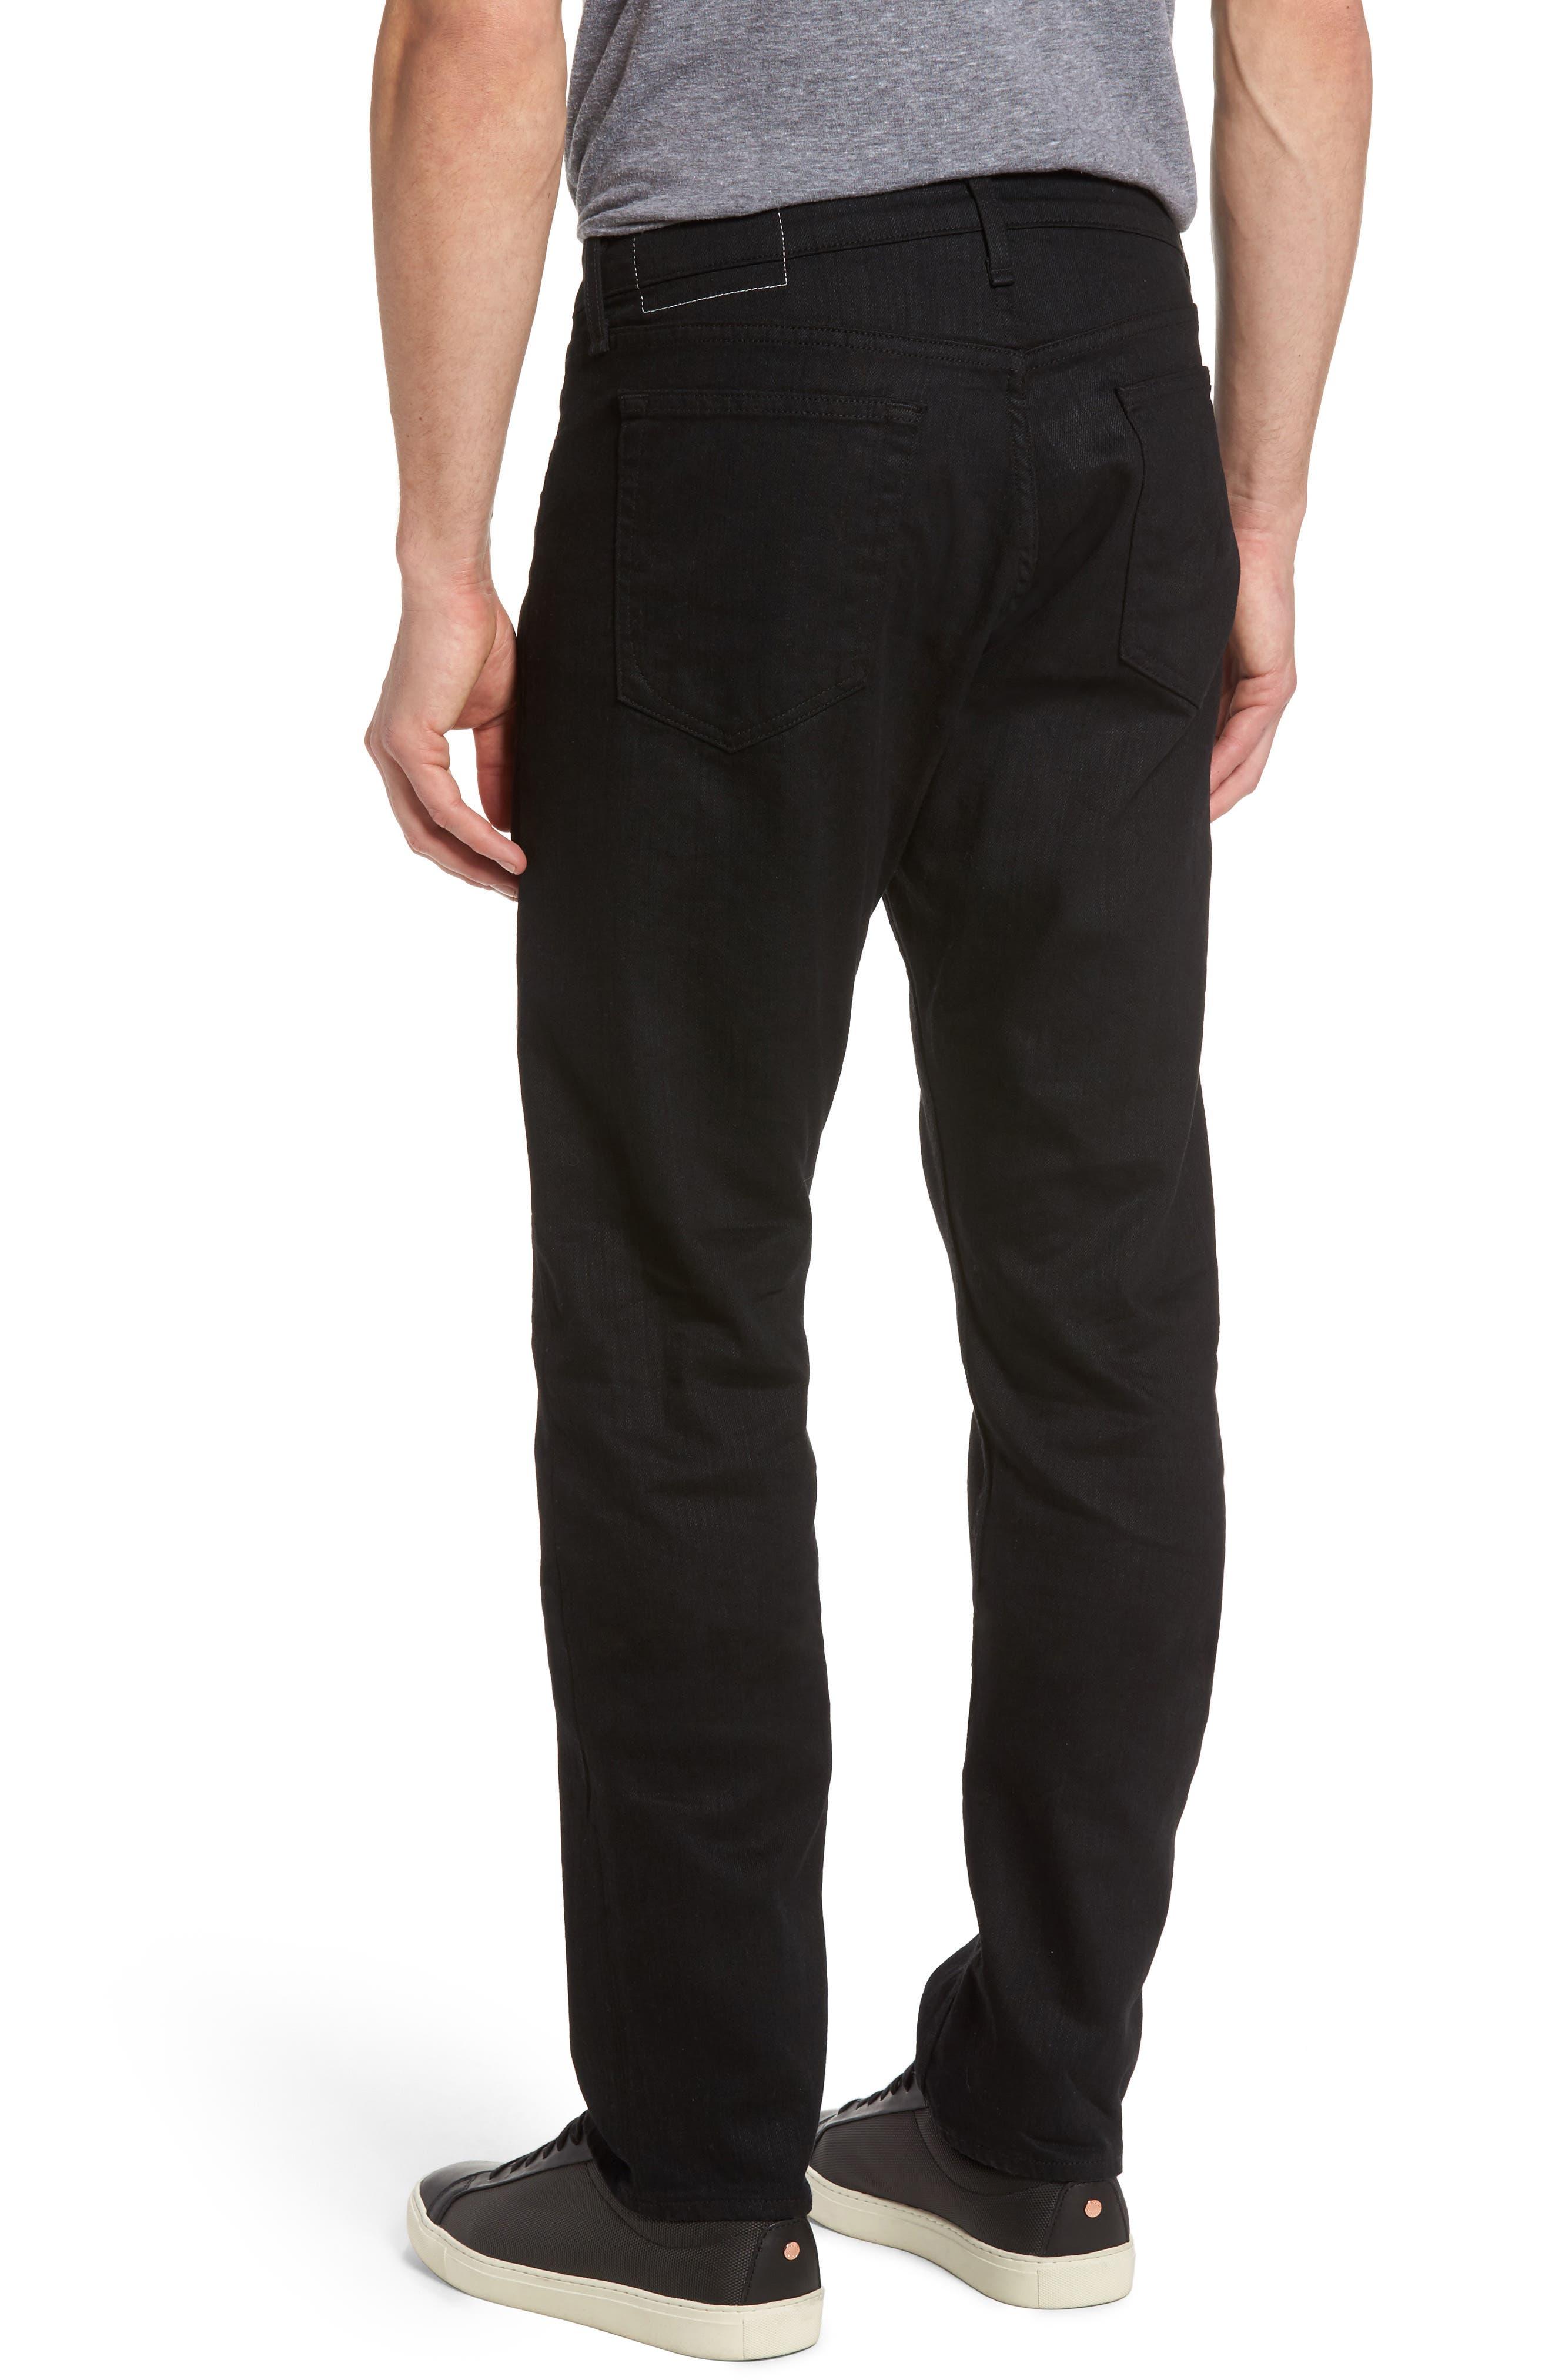 RAG & BONE, Fit 3 Slim Straight Leg Jeans, Alternate thumbnail 2, color, BLACK